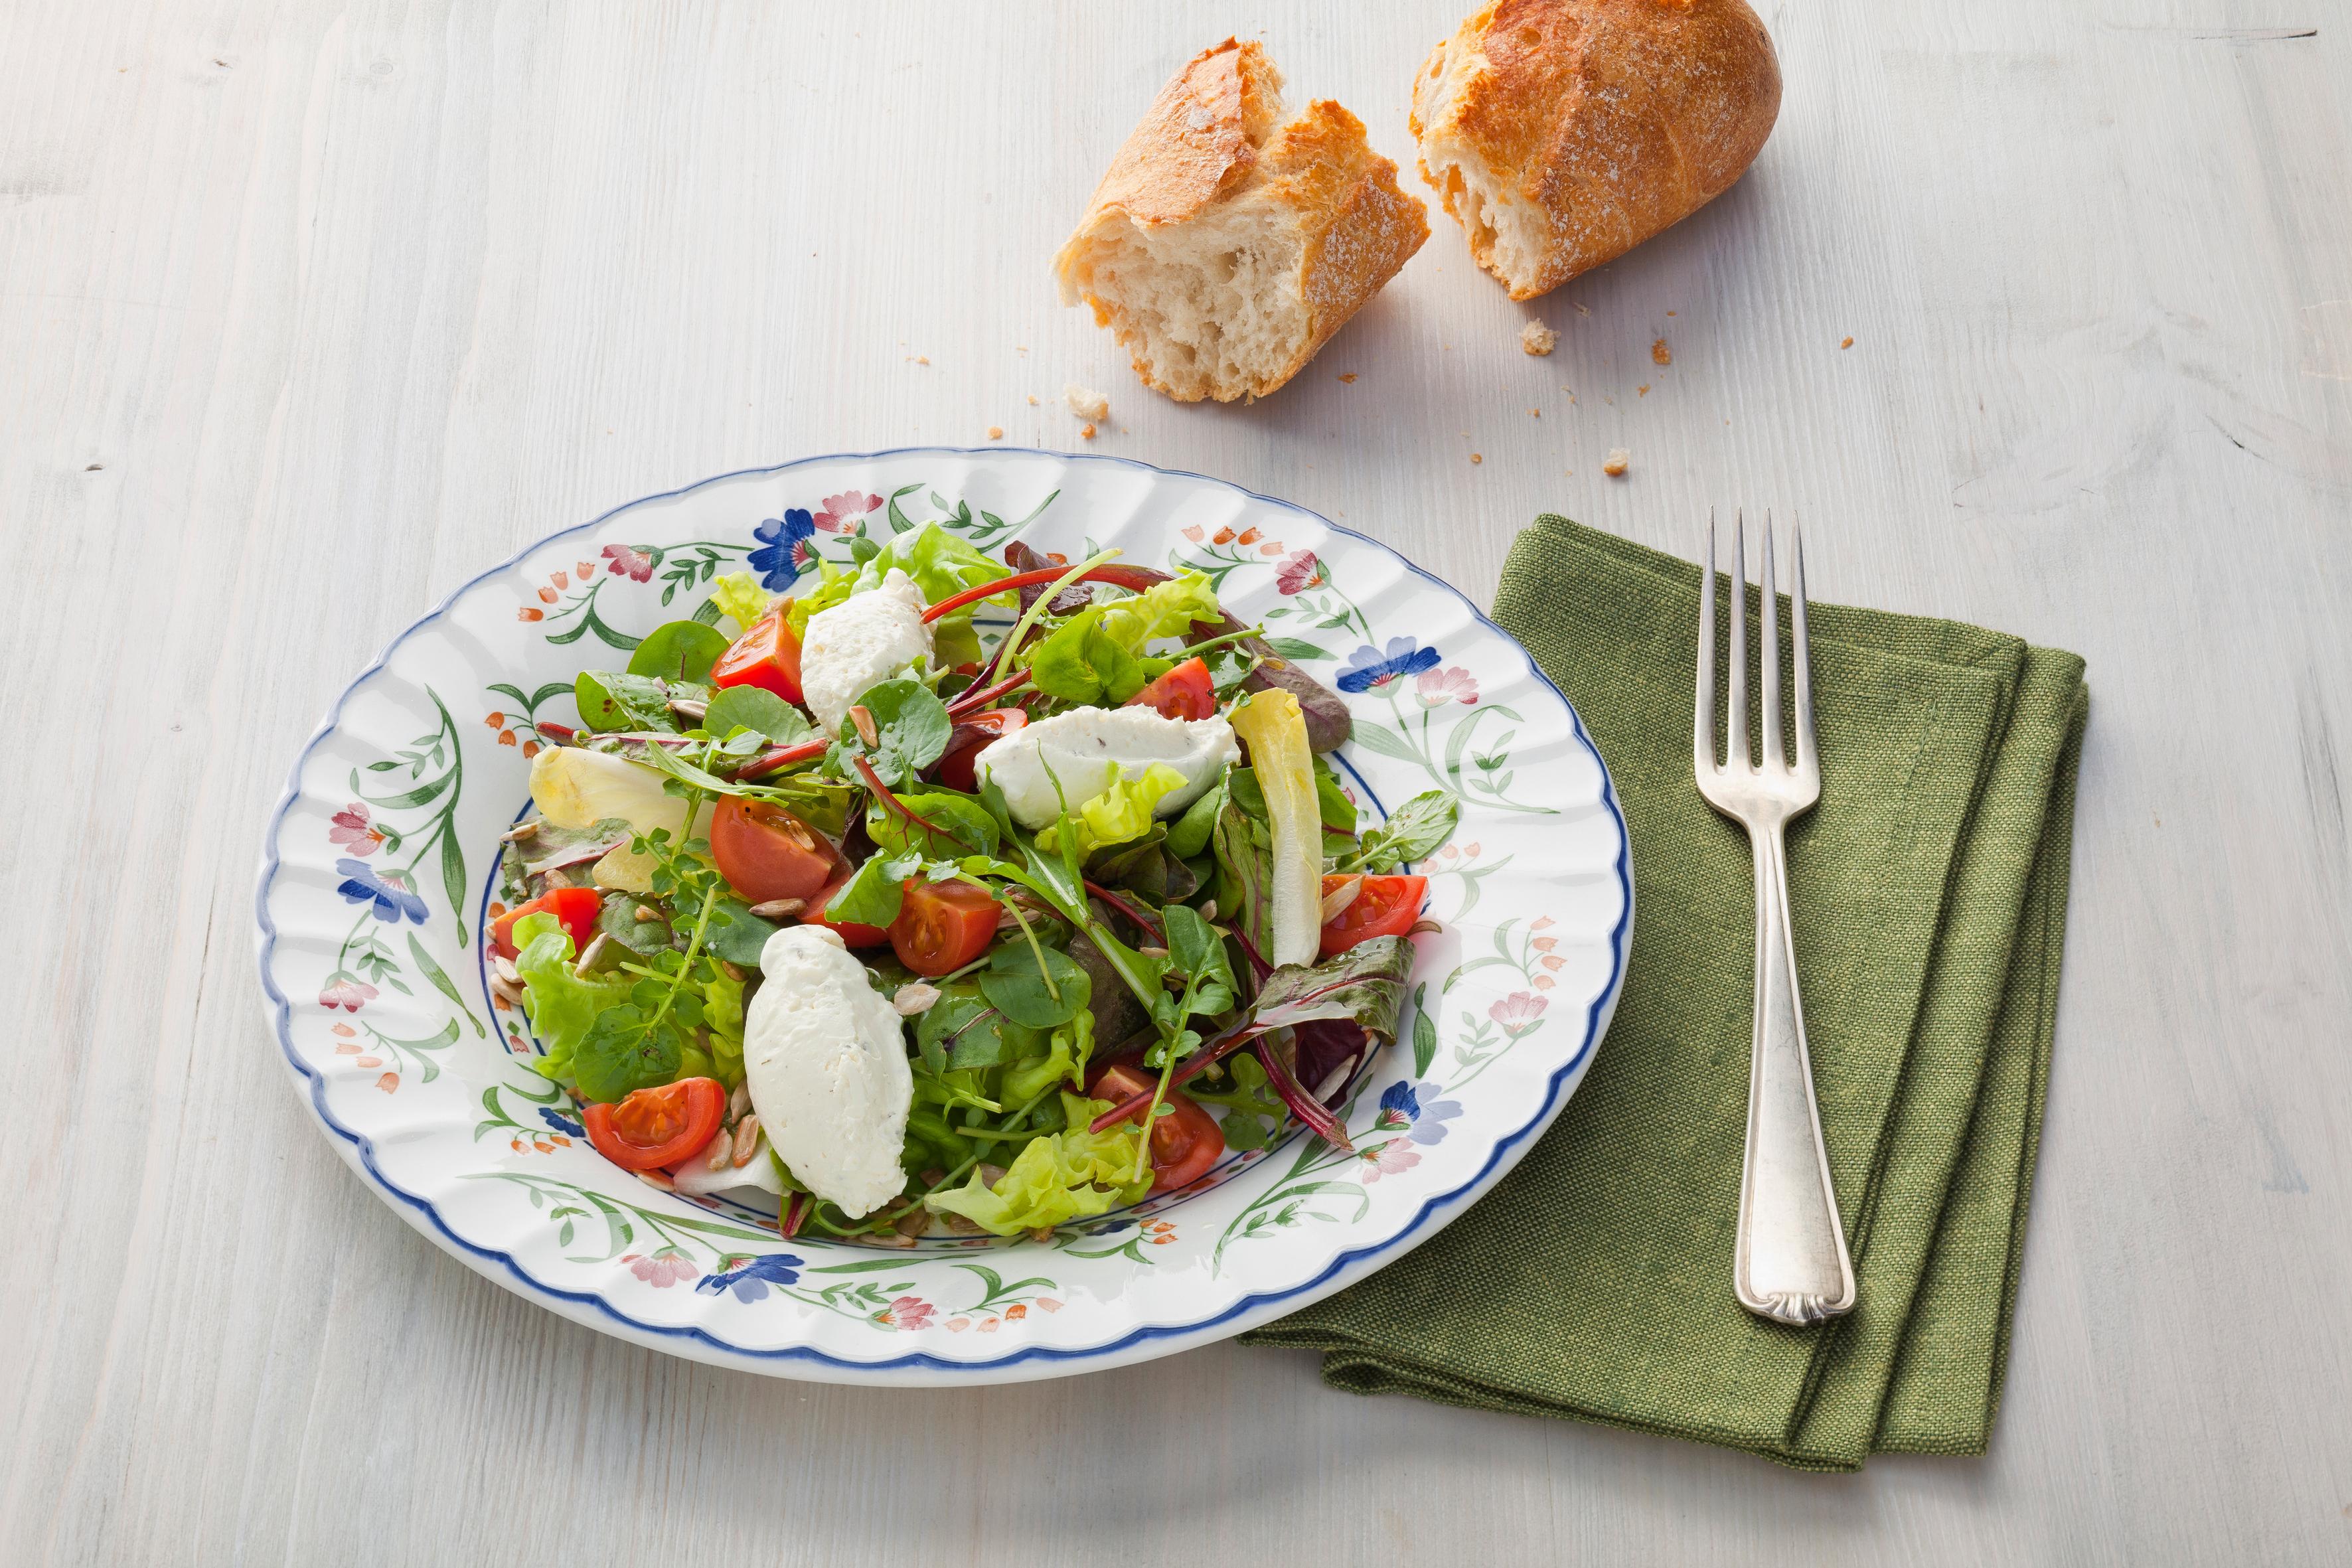 Wildkräutersalat mit Bresso-Nocken - genussvoll kochen